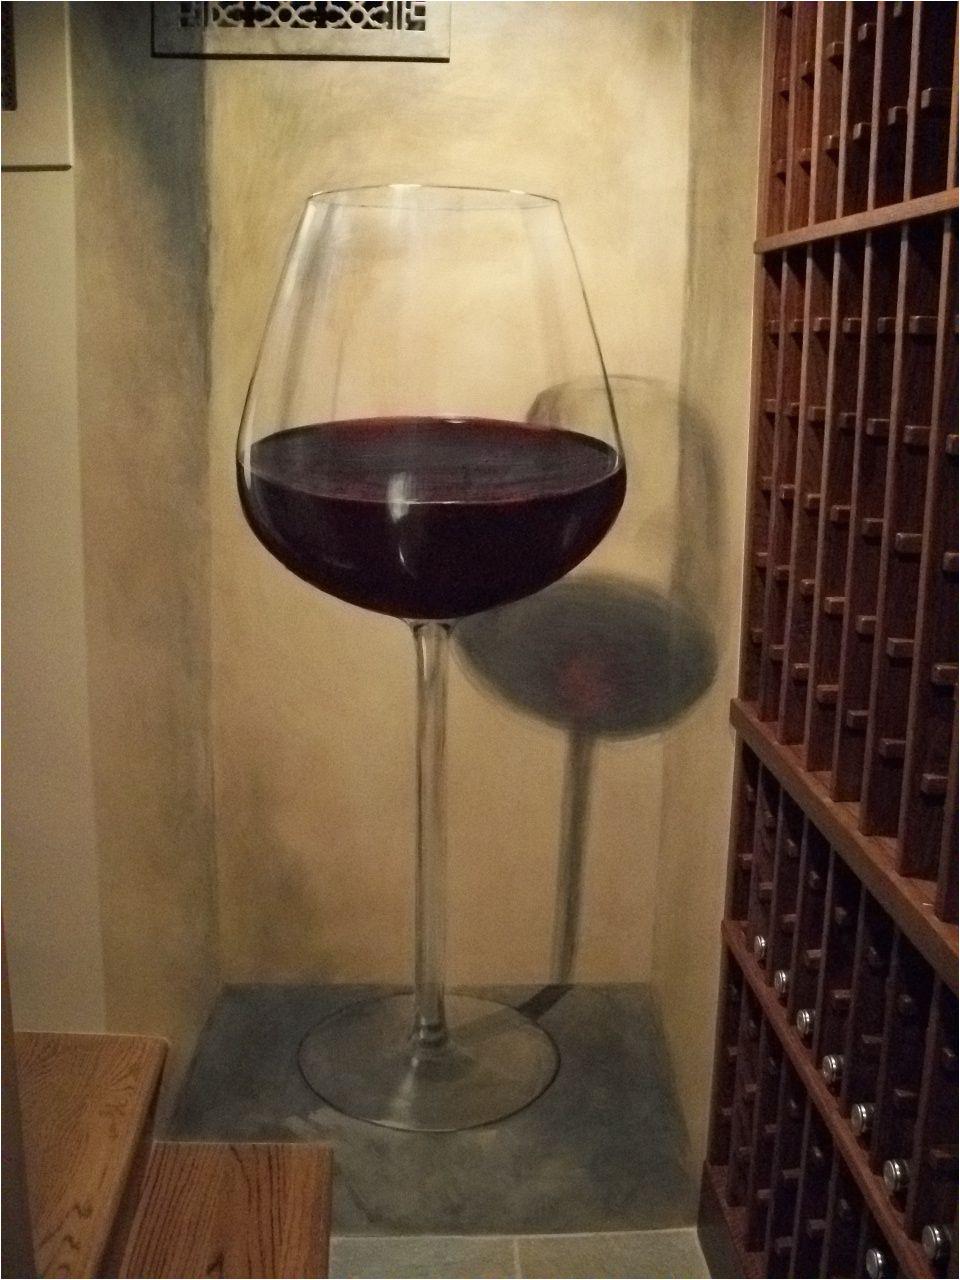 giant wine glass photo google search